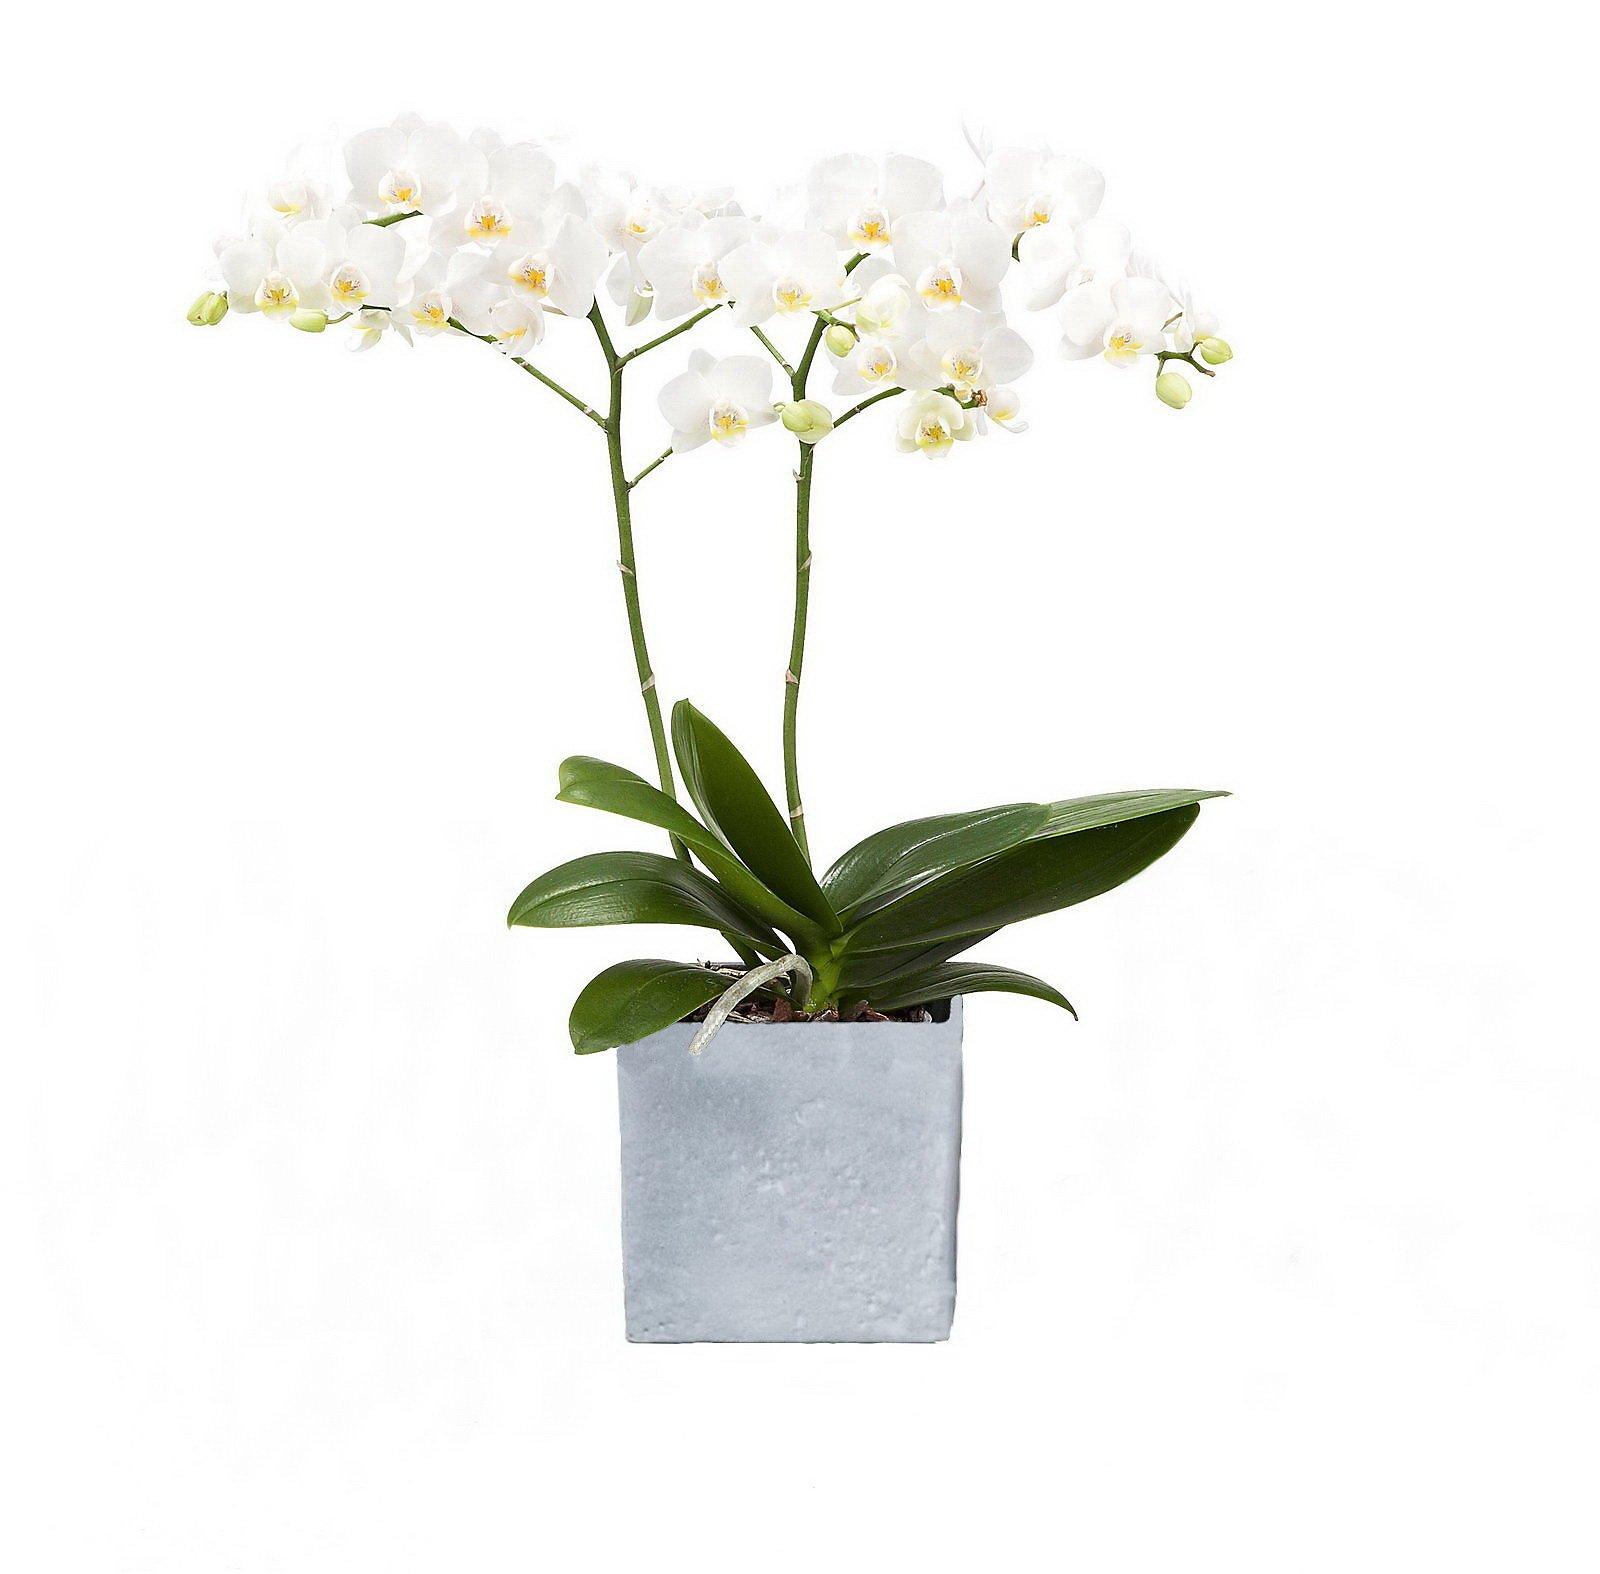 Orchidee Phalaenopsis Weiss Bluhend 2 Triebig 1 Pflanze 1